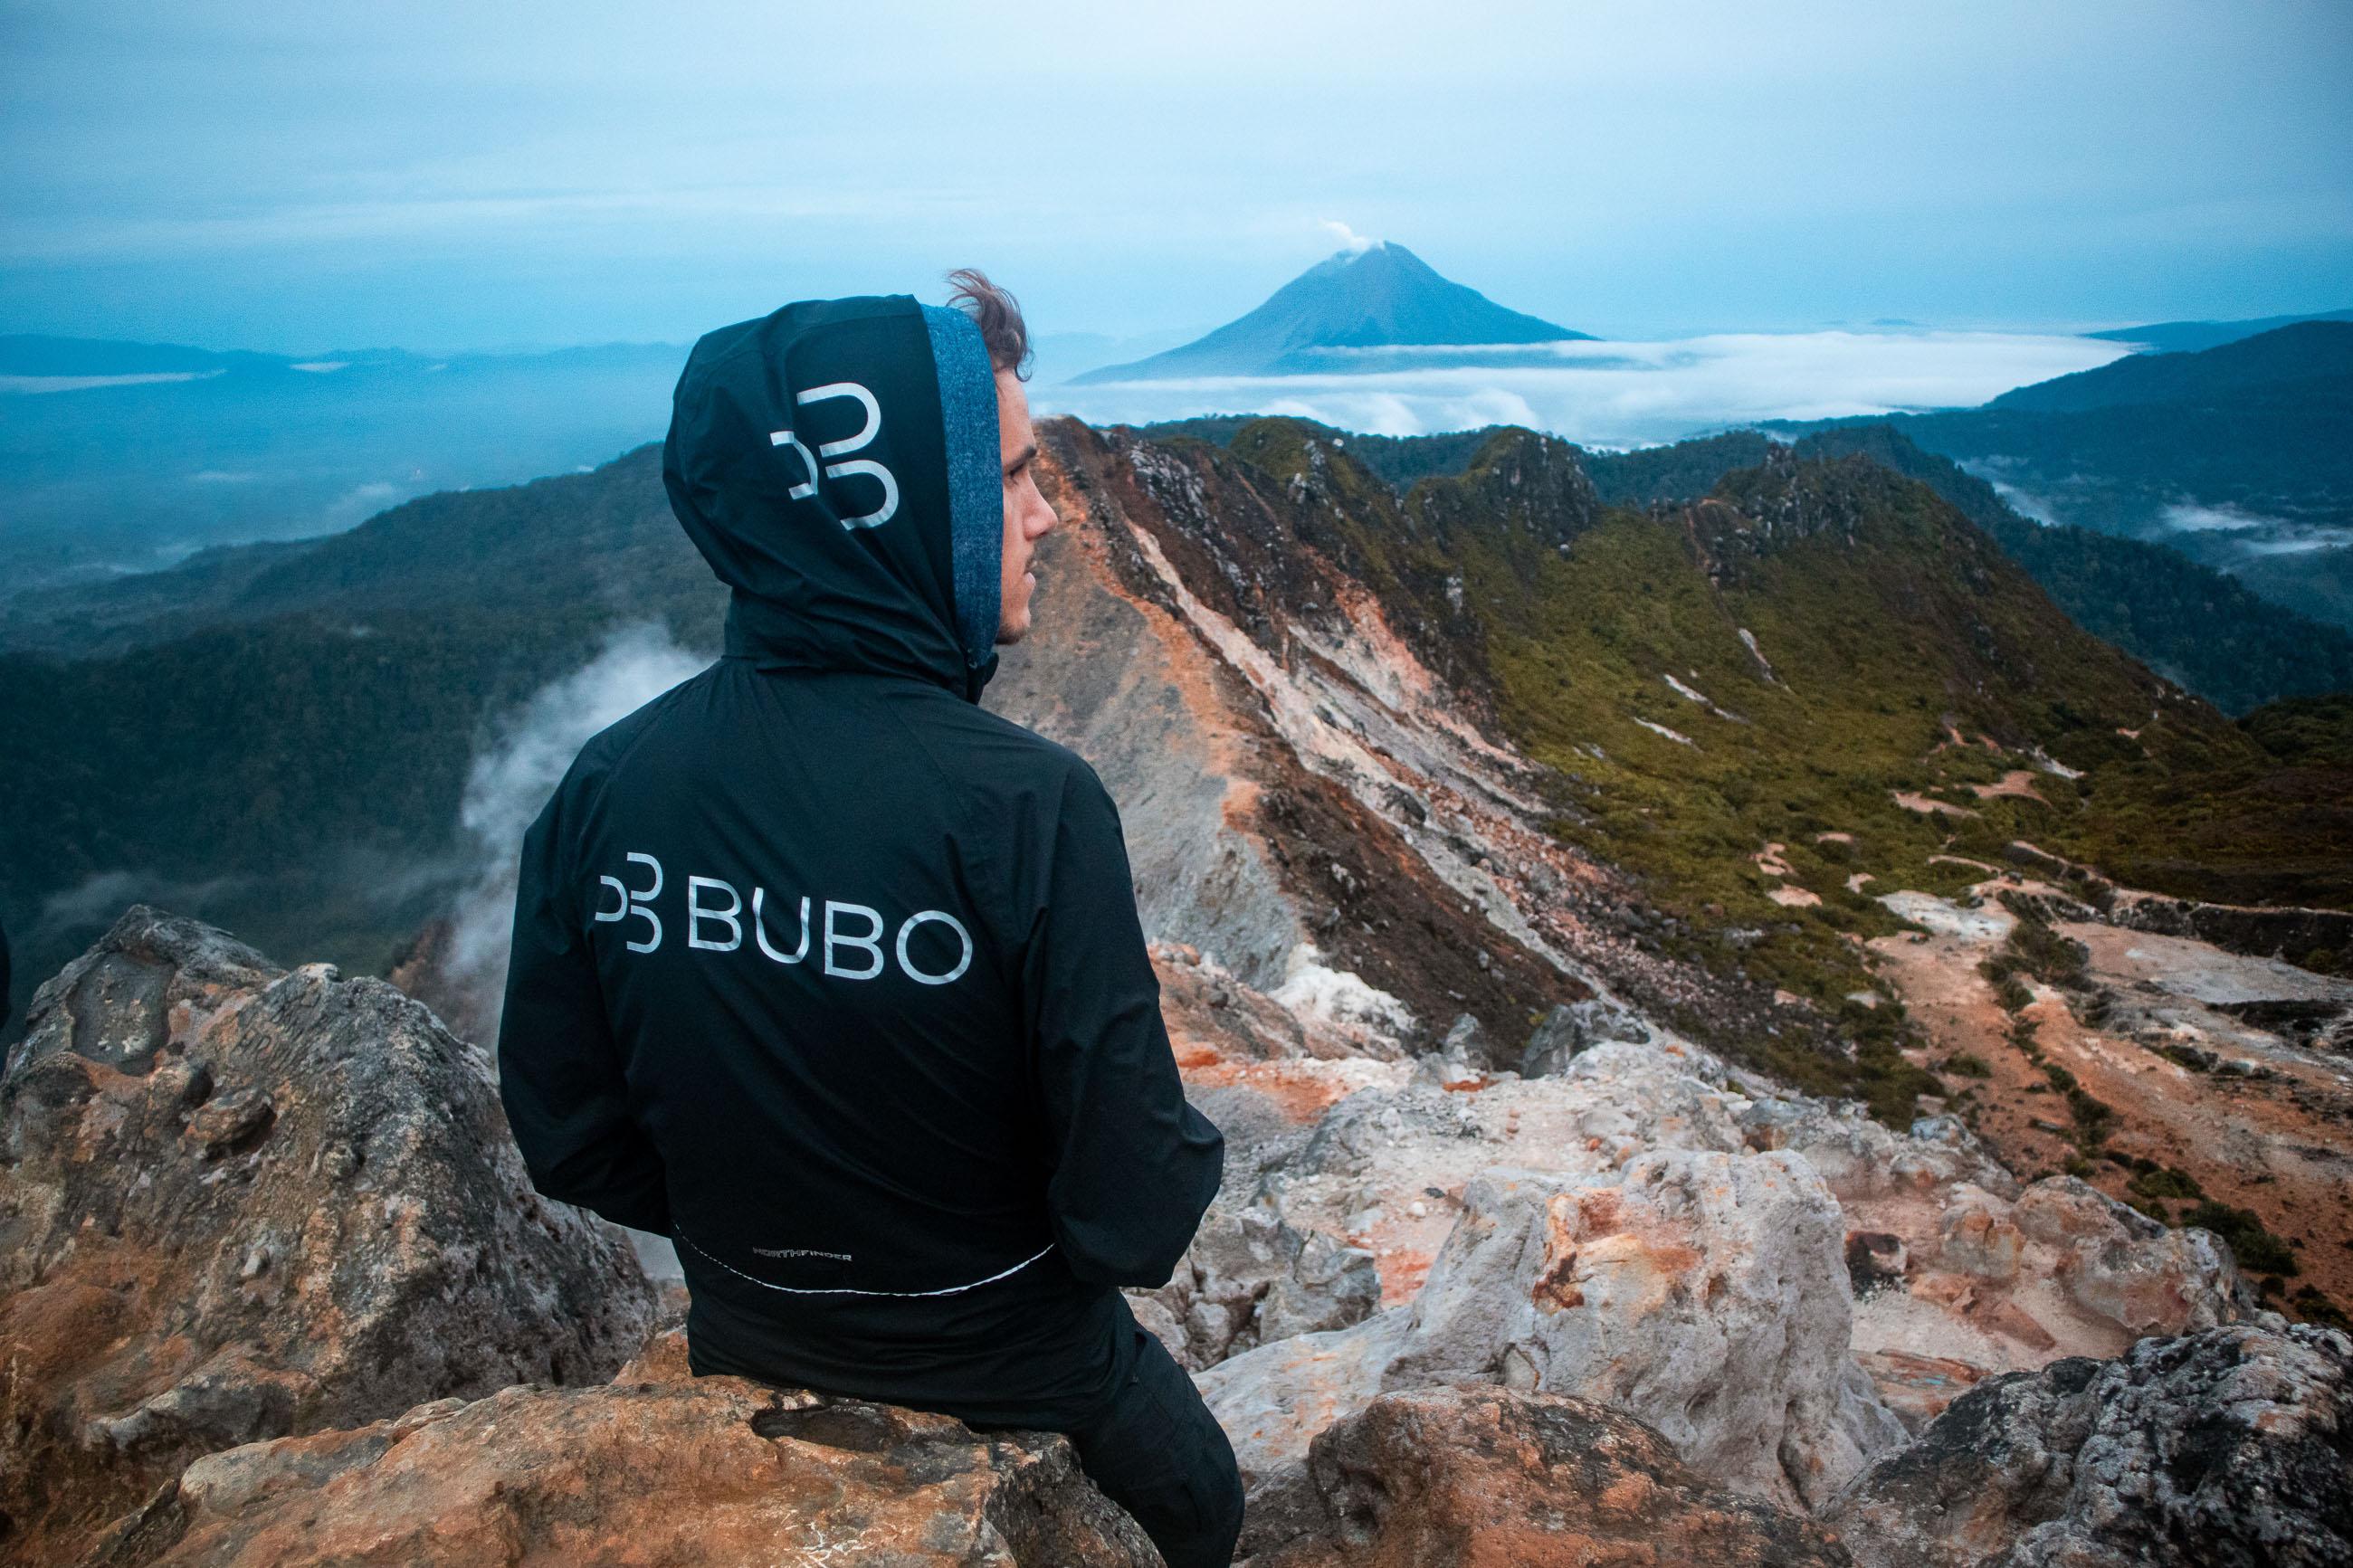 https://bubo.sk/uploads/galleries/7542/tomashornak_indonezia_sumatra_img_0141-1-31.jpg